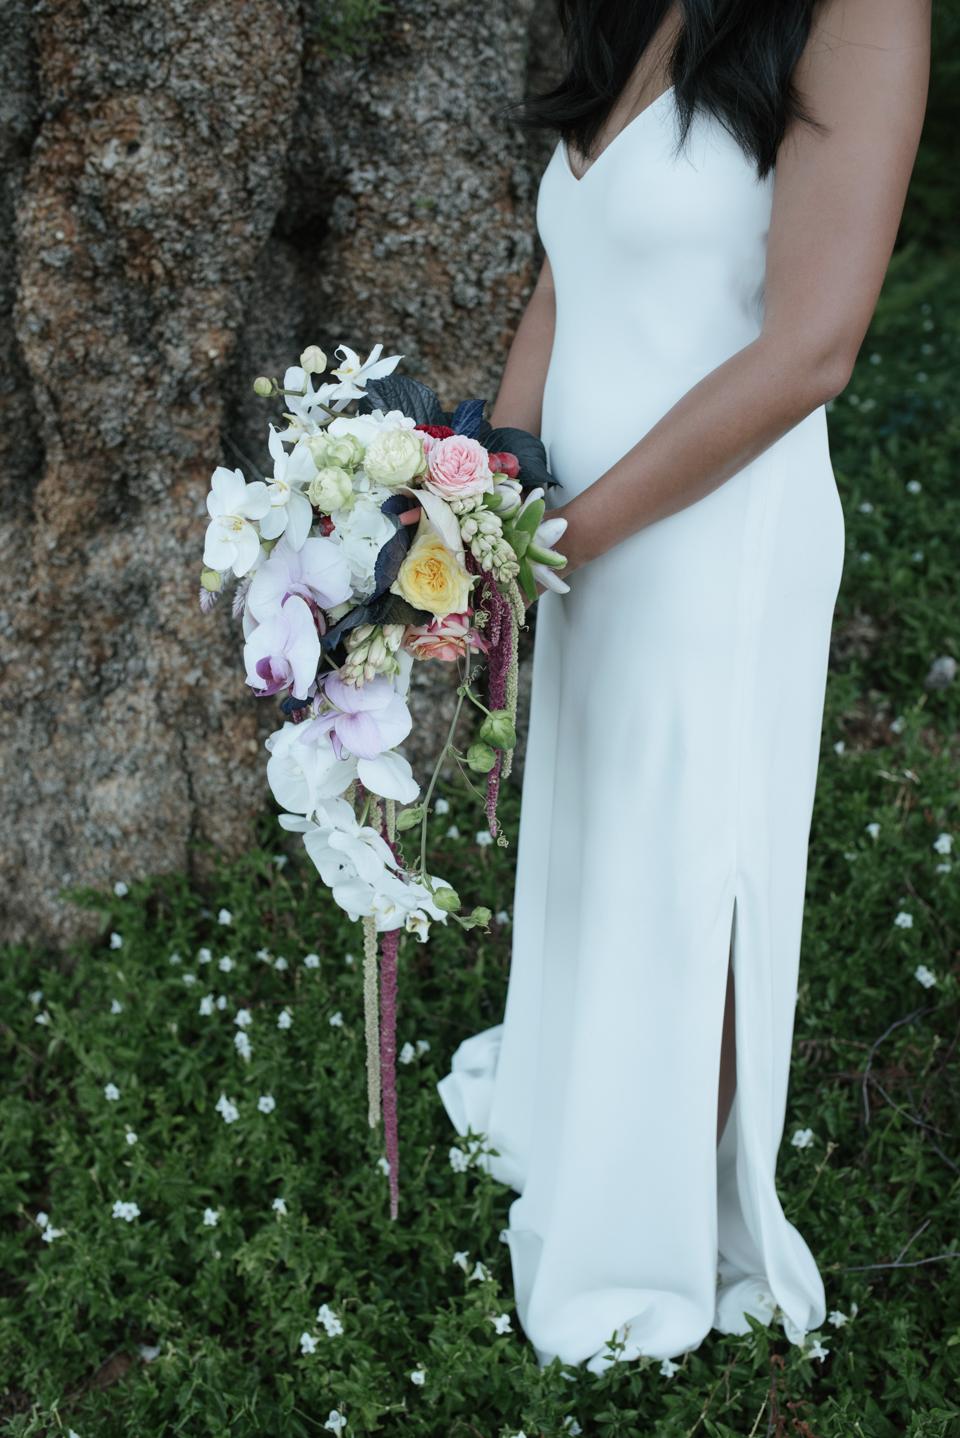 Grace and Alfonso wedding Clouds Estate Stellenbosch South Africa shot by dna photographers 716.jpg